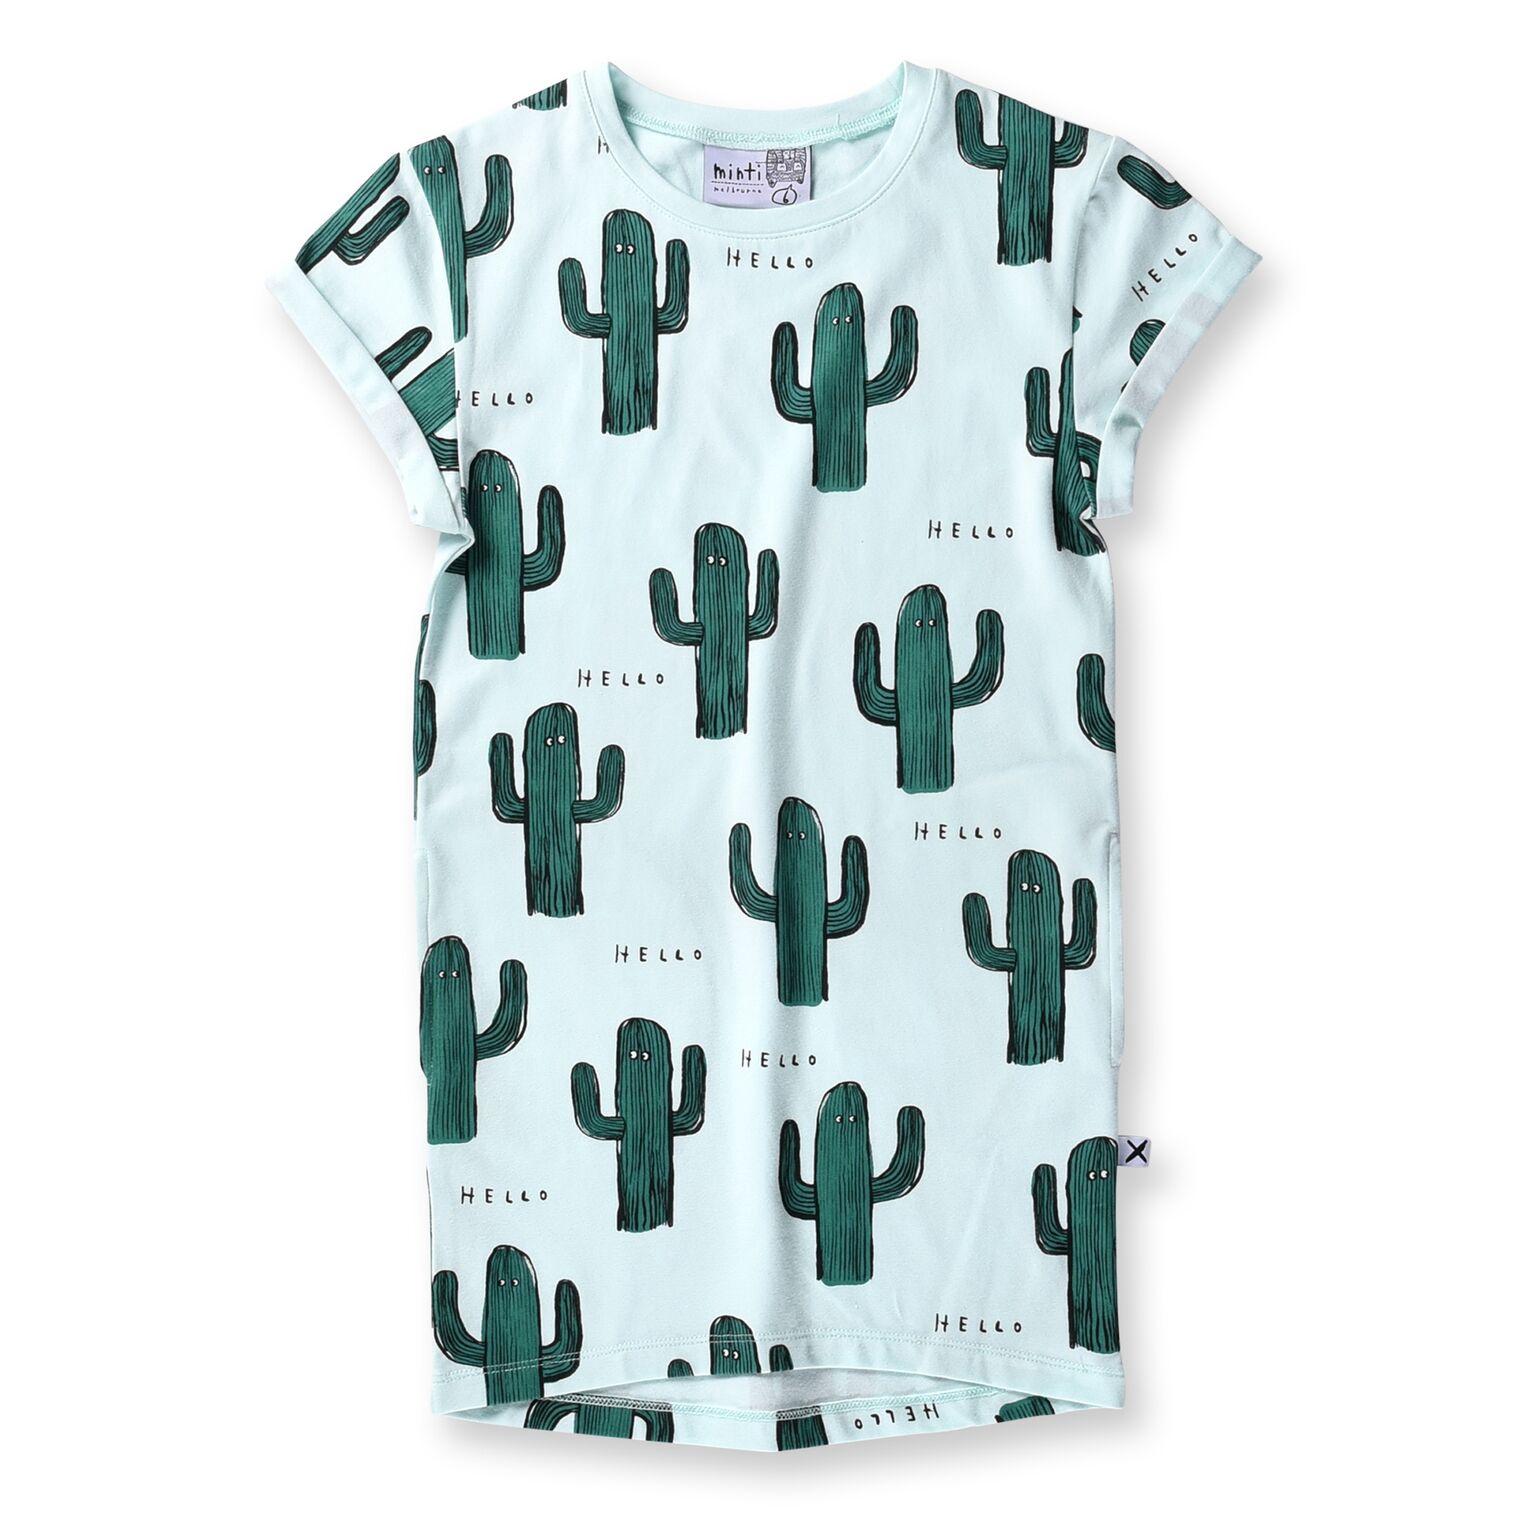 Minti Cactus Buddies Rolled Up Tee Dress